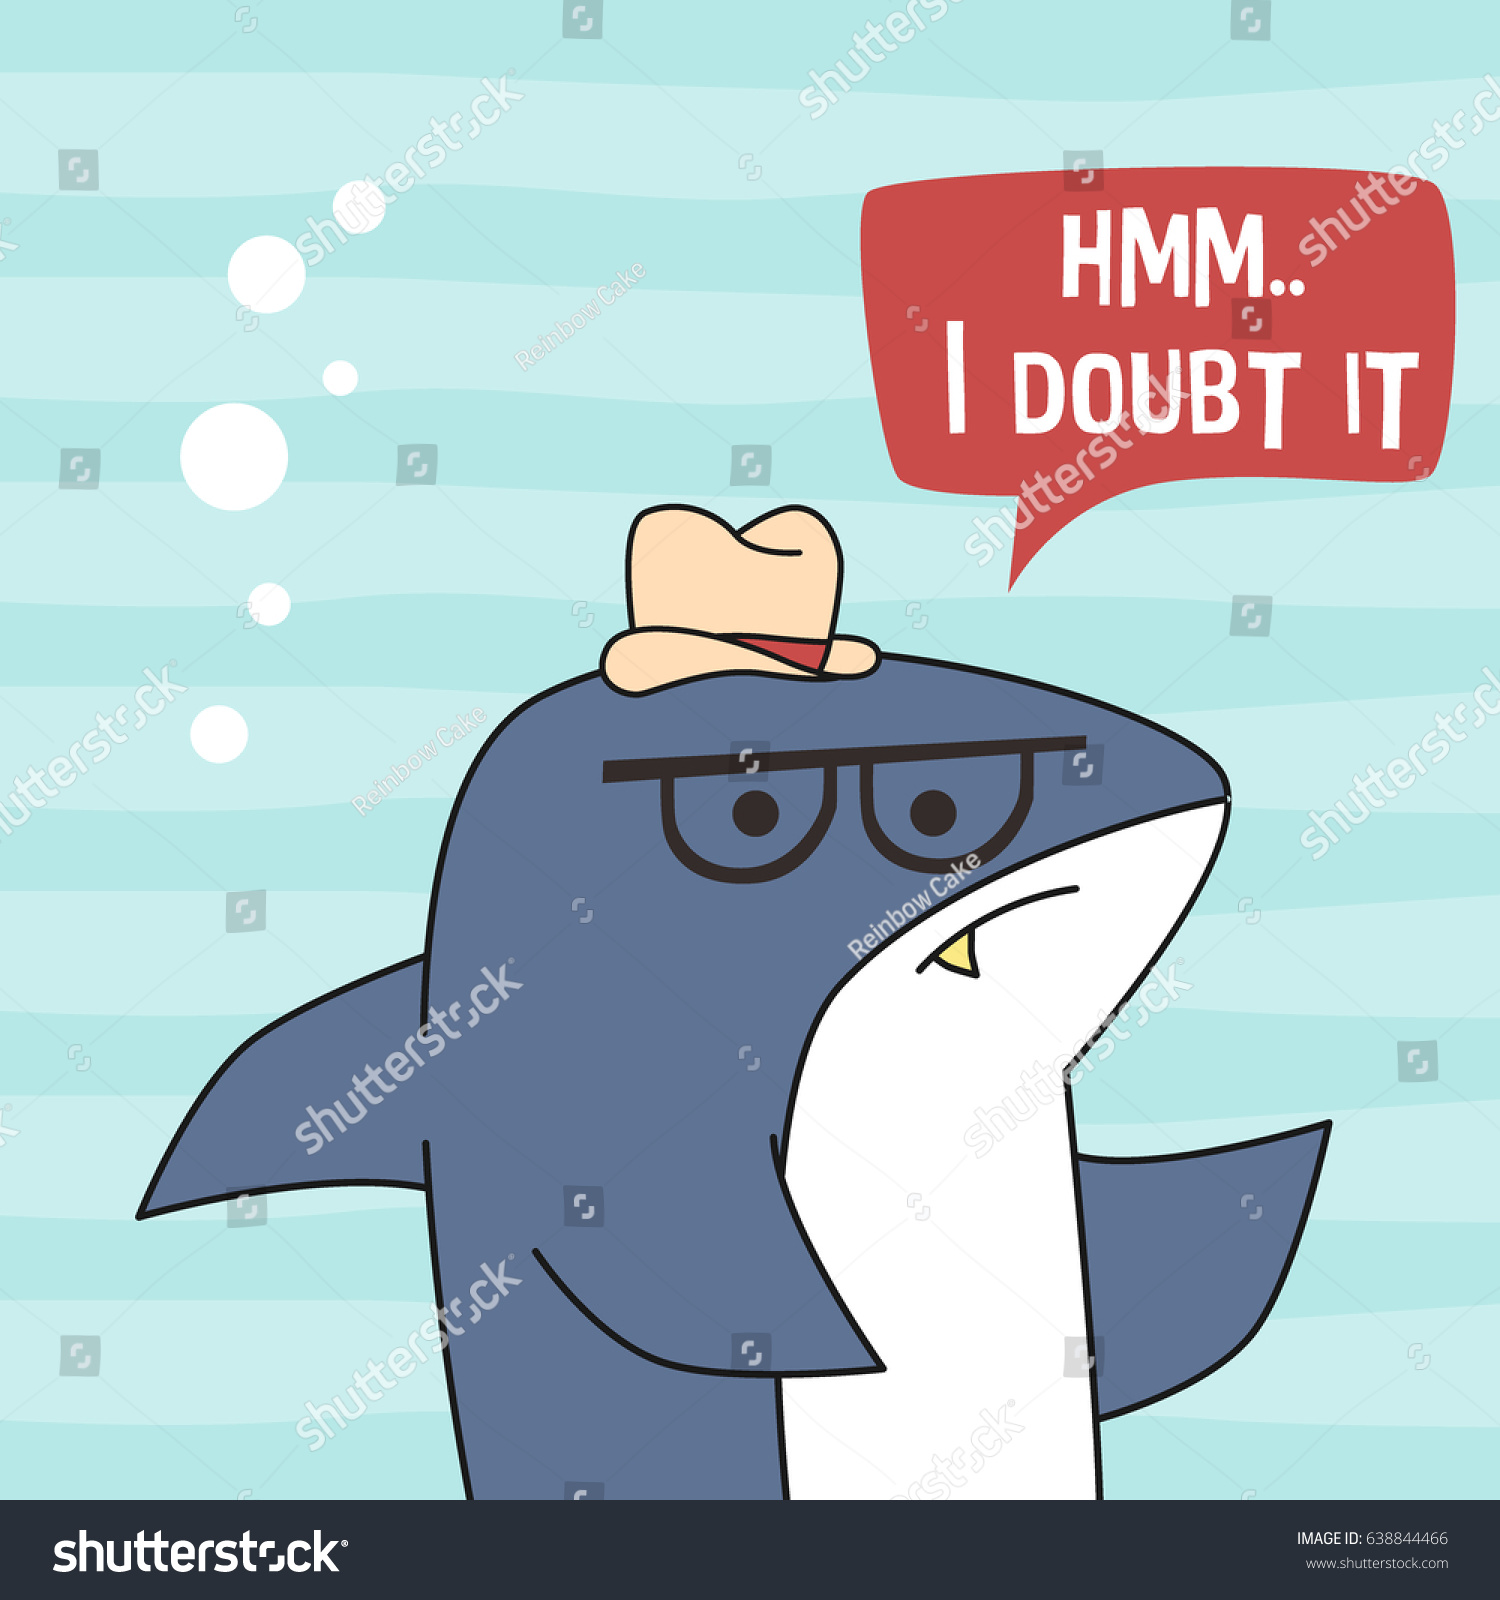 awesome retro cute shark design tshirt stock vector 638844466